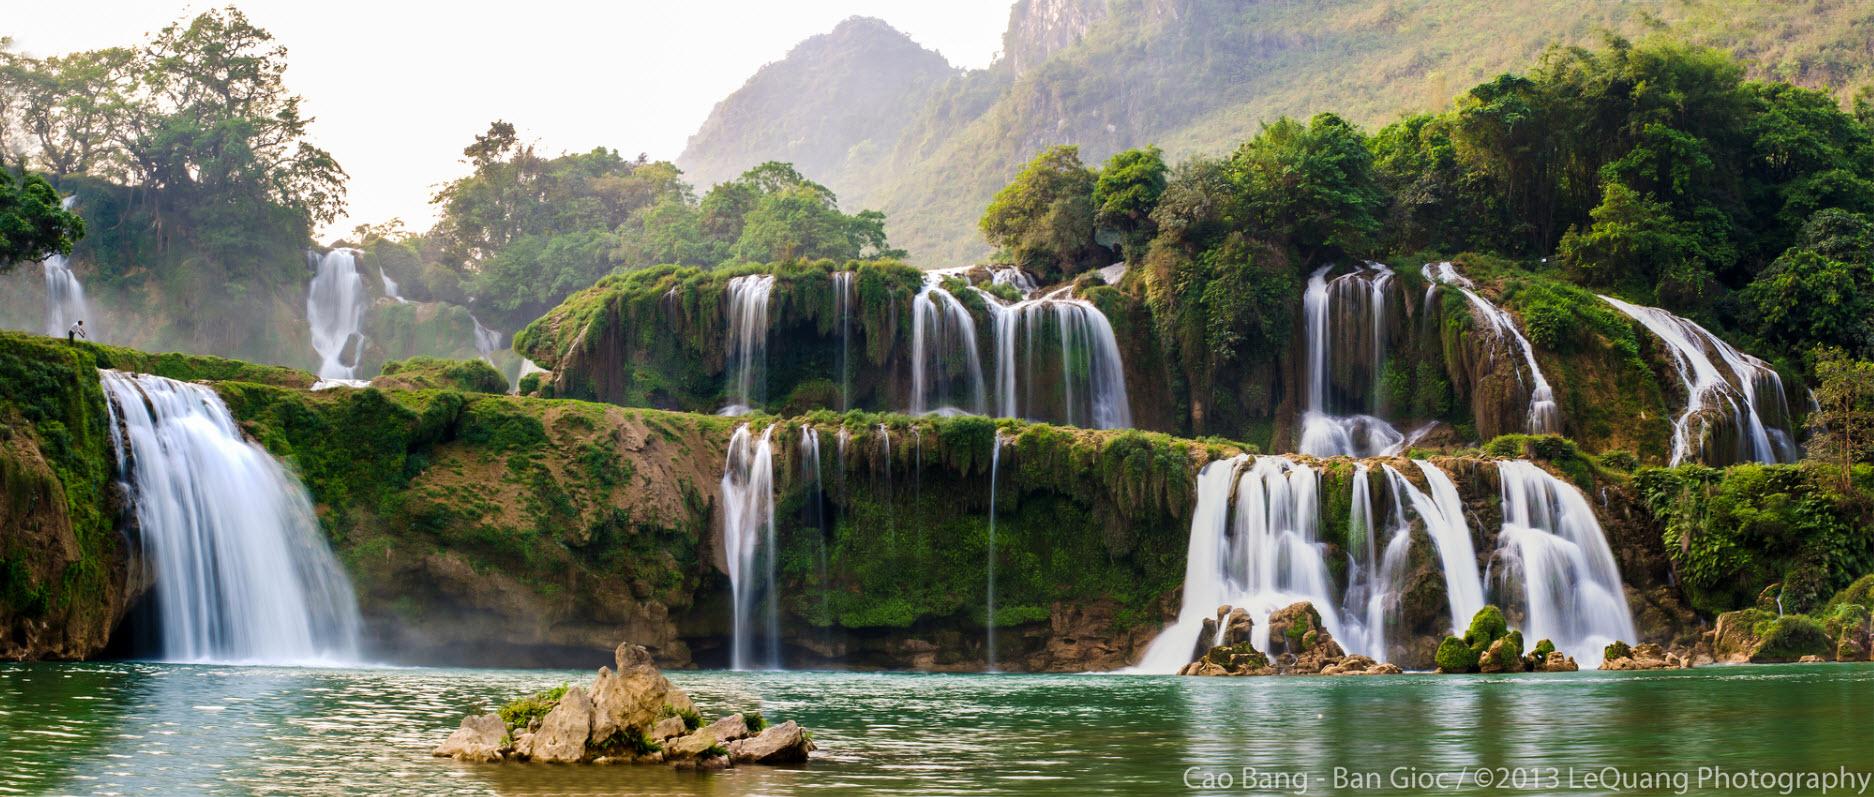 Nice wallpapers Ban Gioc–Detian Falls 1874x797px